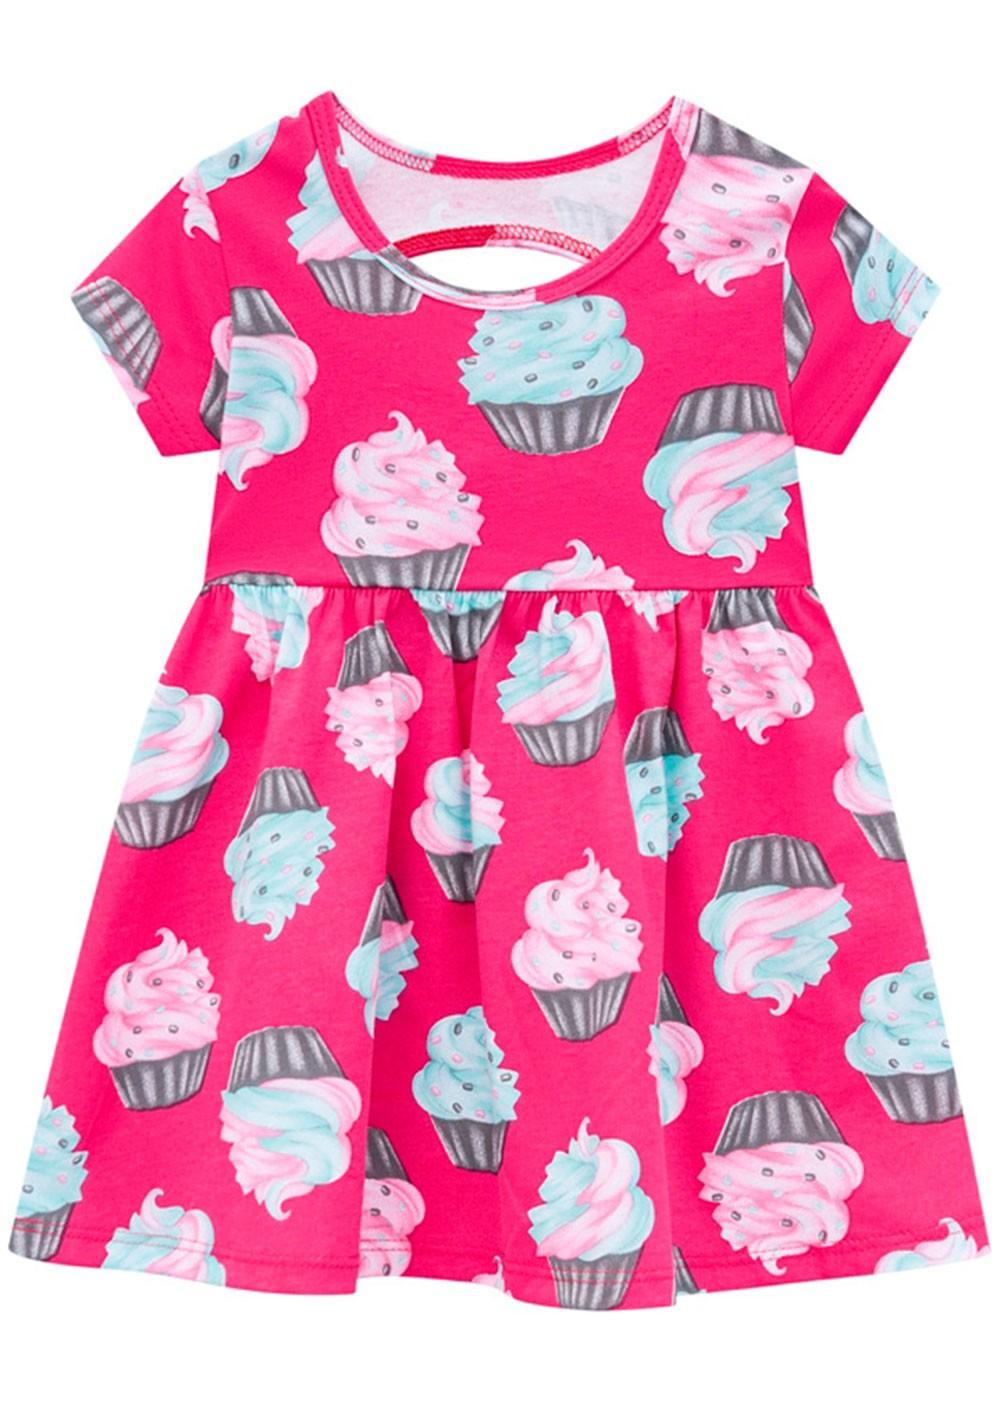 Vestido Infantil Rosa Choque Estampa Sorvete - Kyly